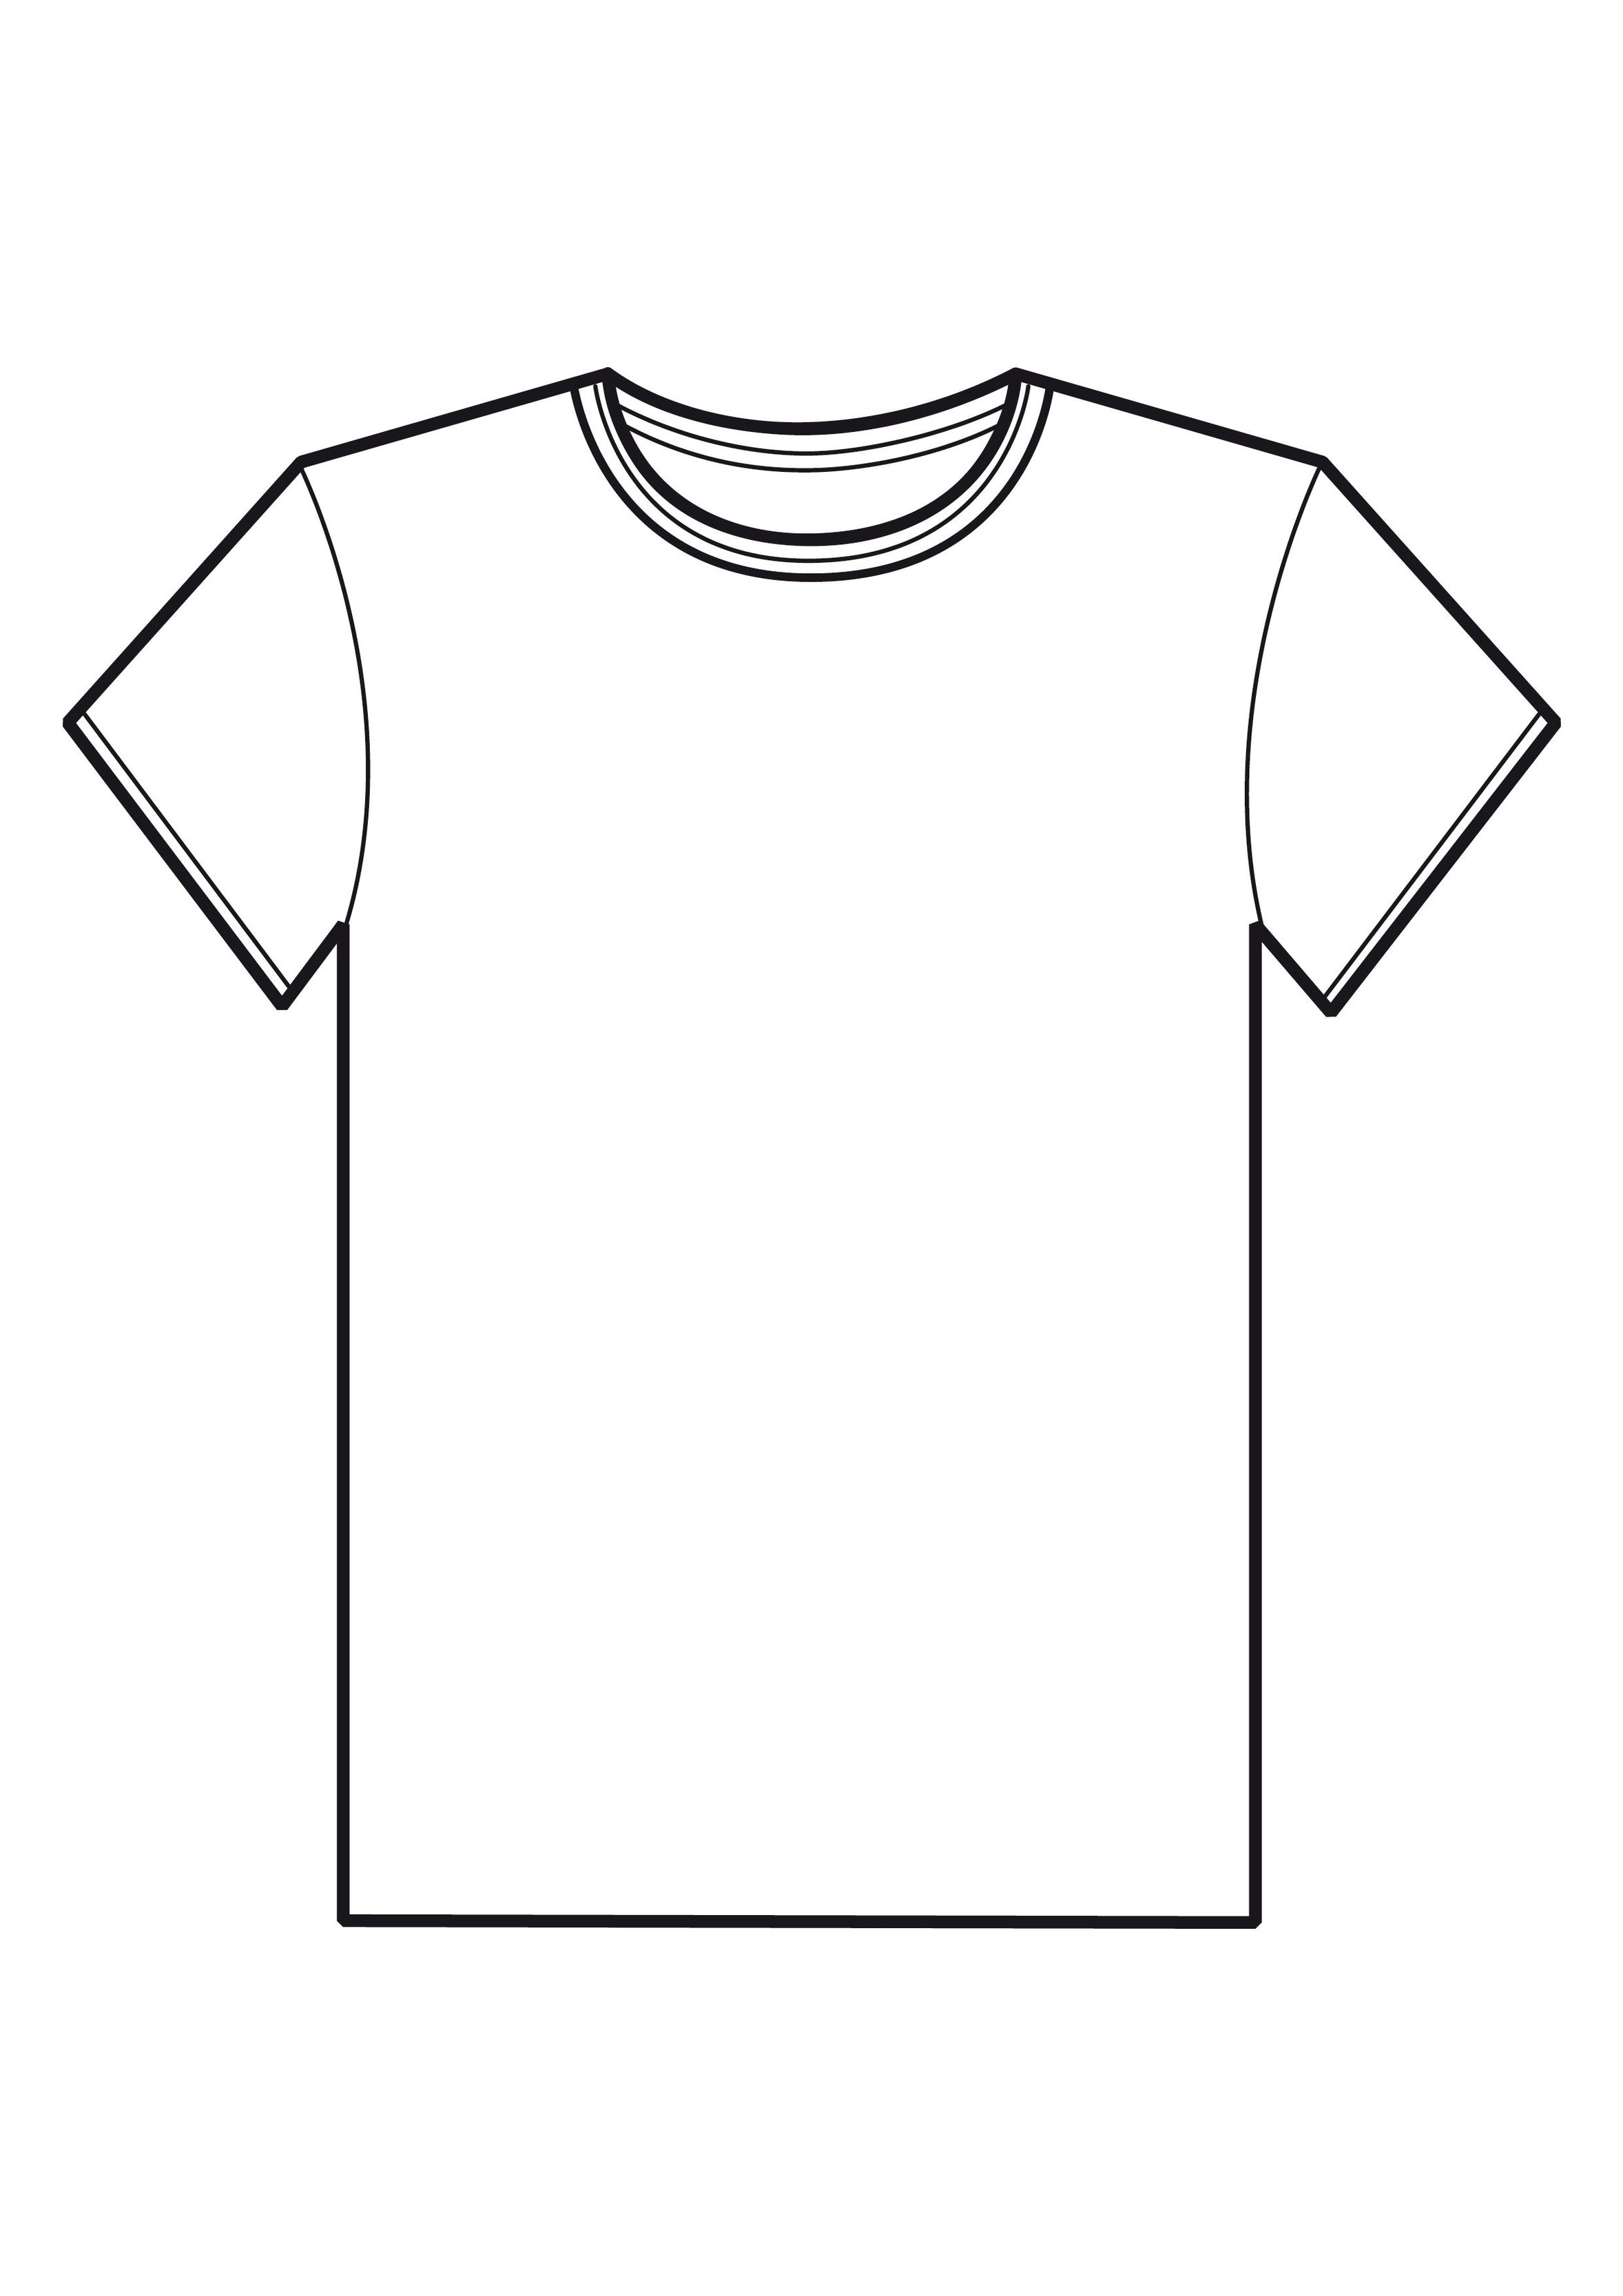 T shirt shirt clip art images free clipart.